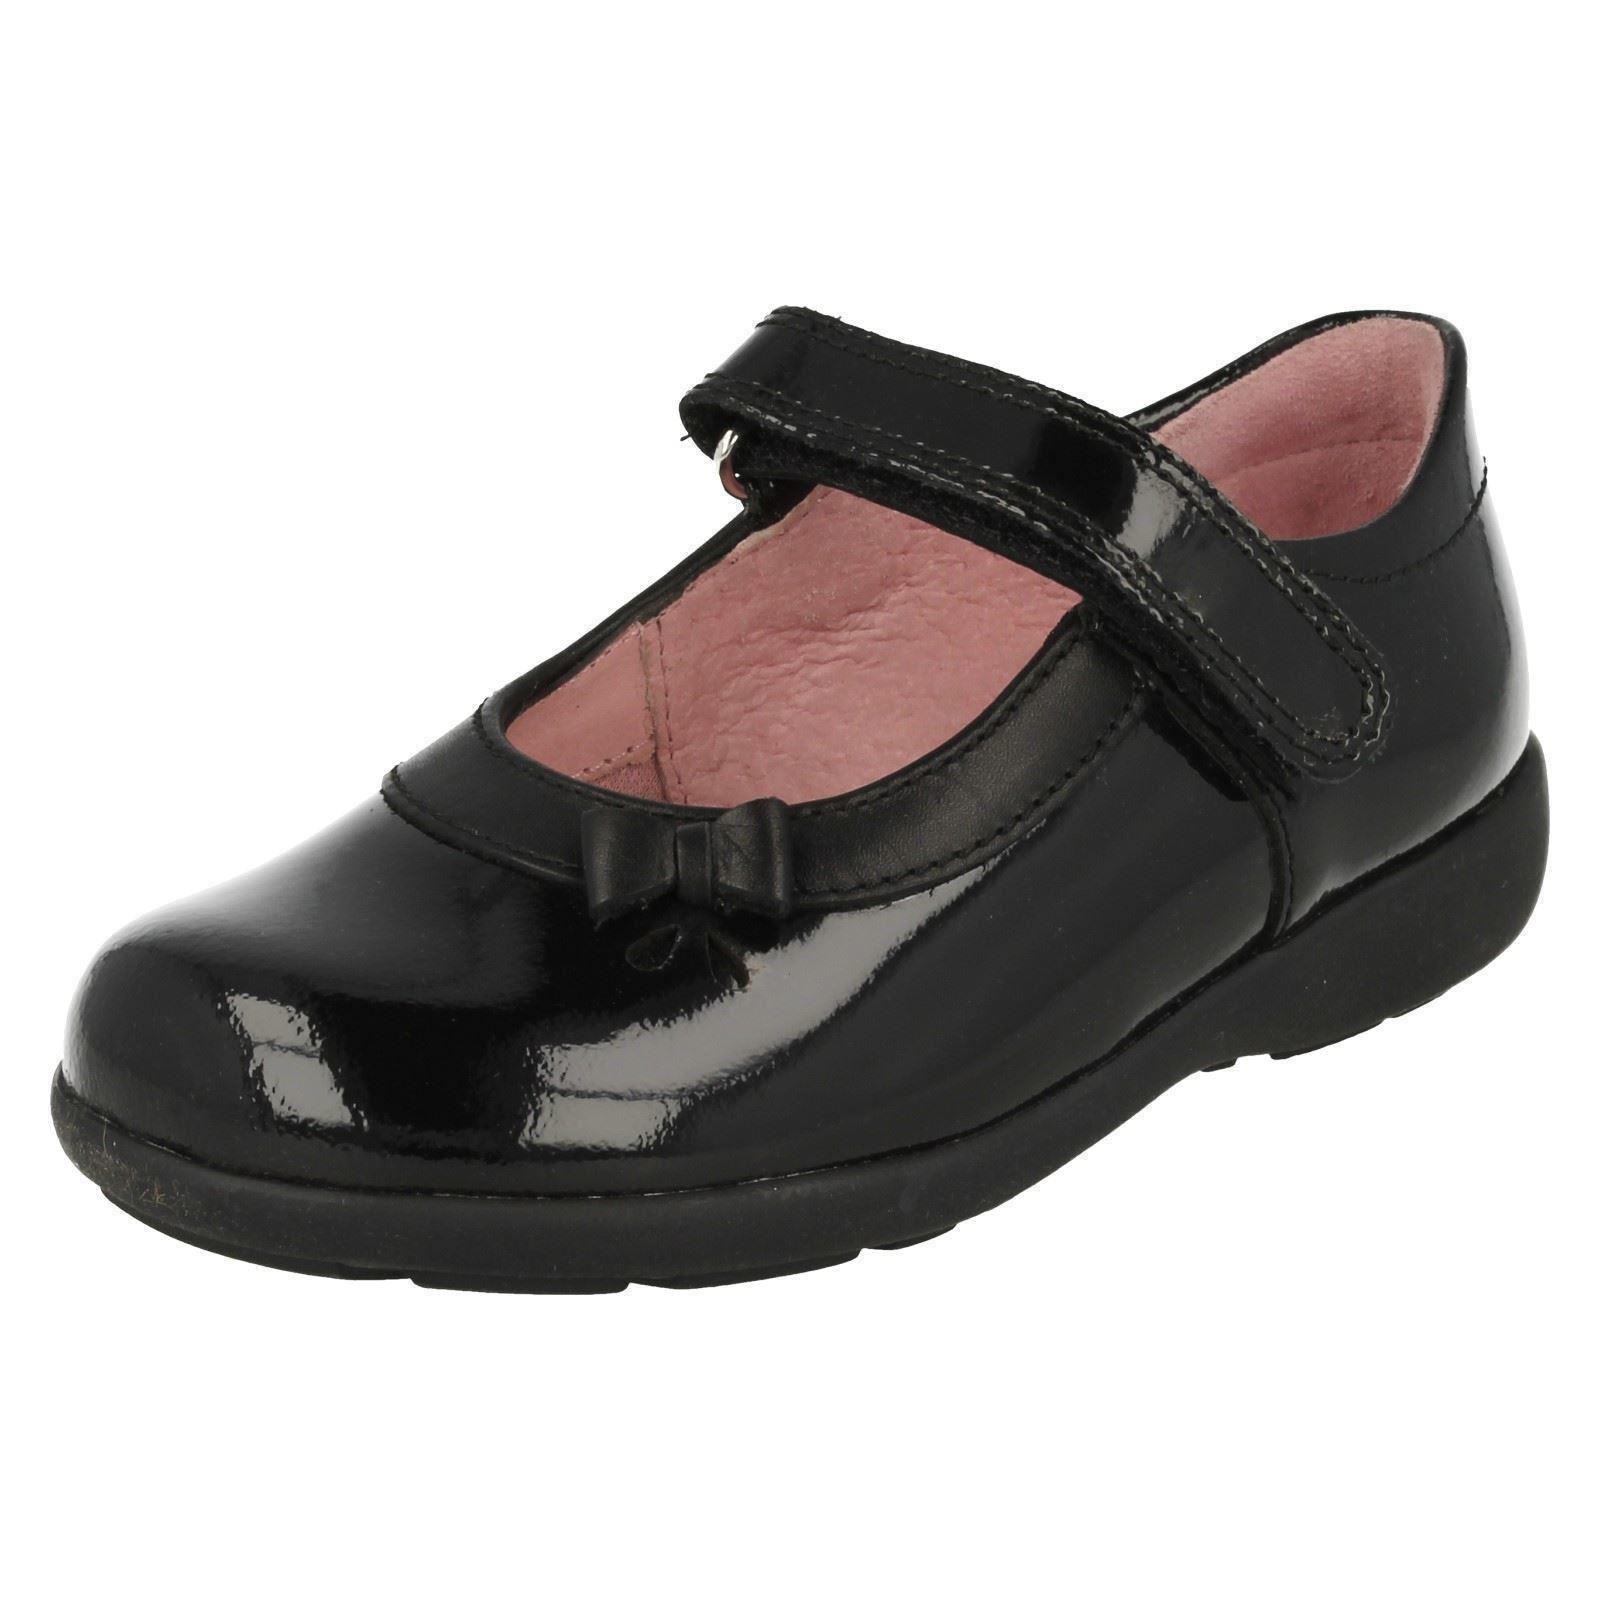 f4cca5e0 Ninas-Bebe-Startrite-Zapatos-de-COLEGIO-MARIA miniatura 18